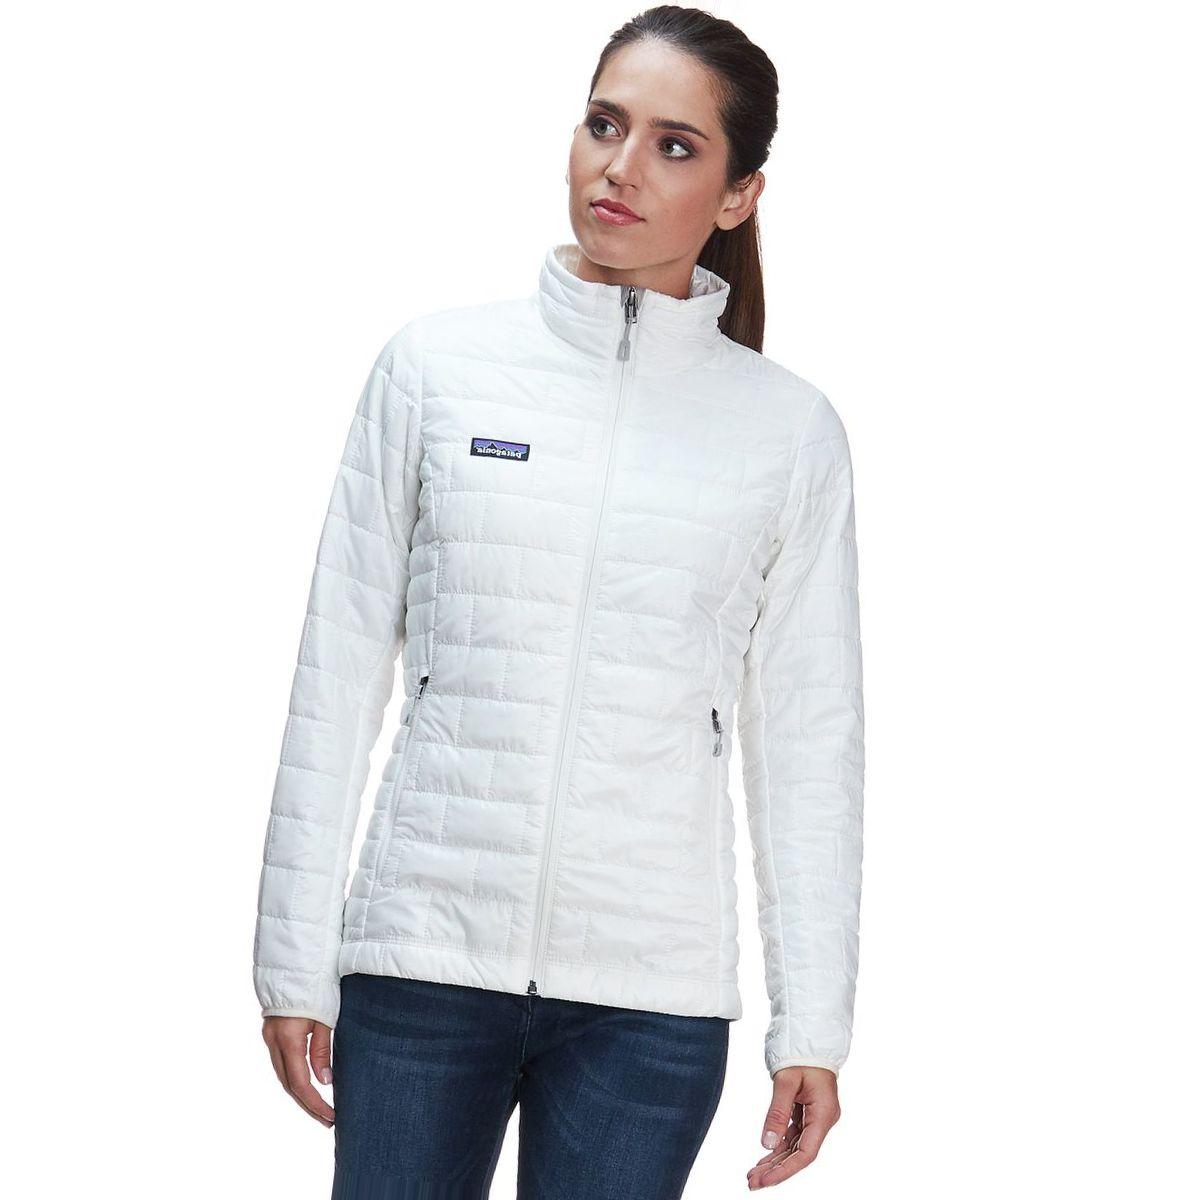 Patagonia Nano Puff Insulated Jacket - Women's